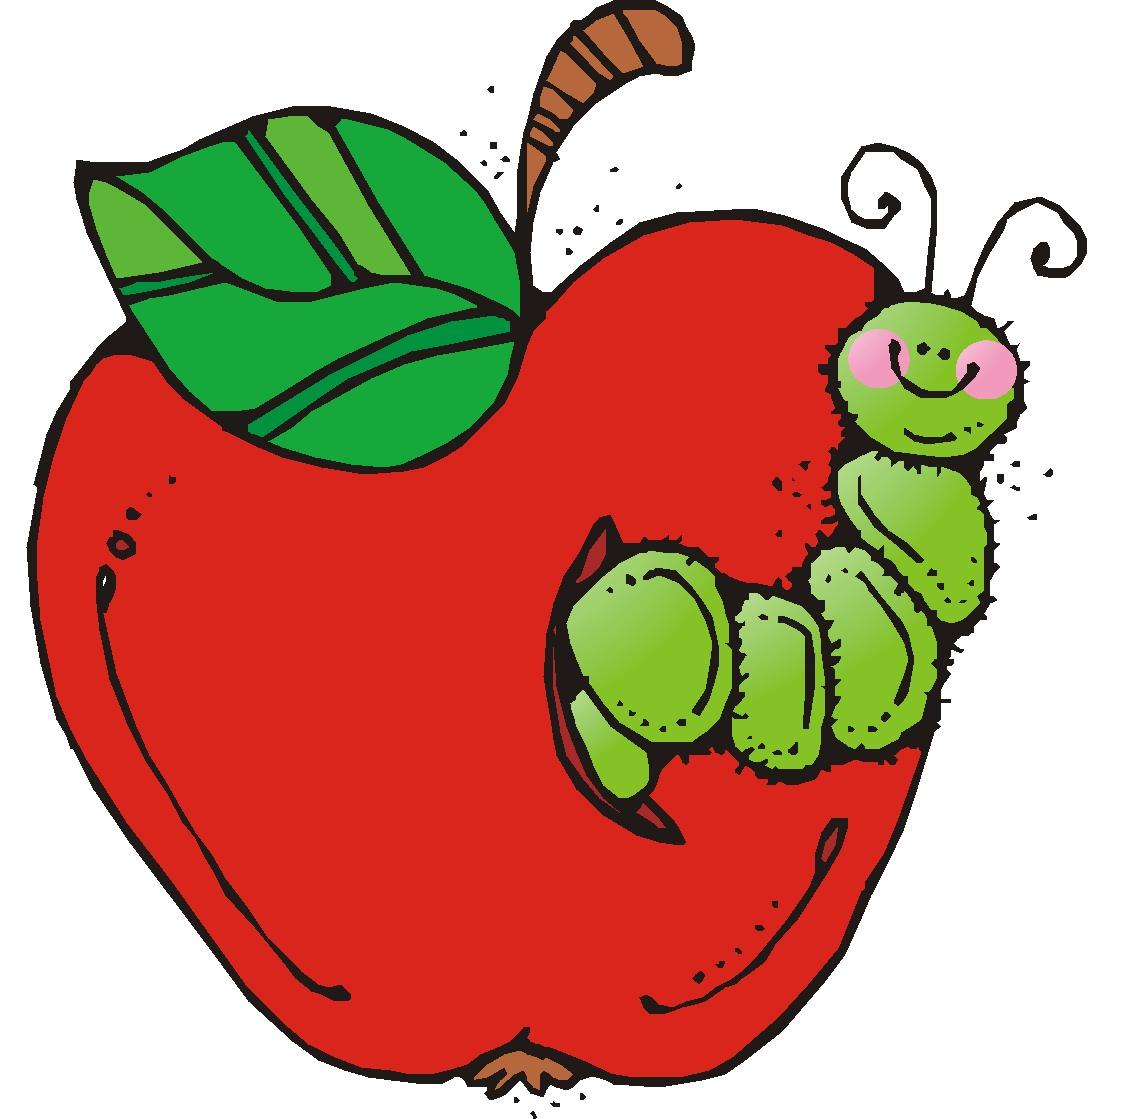 1125x1119 Teacher Apple Border Clipart Free Images 4